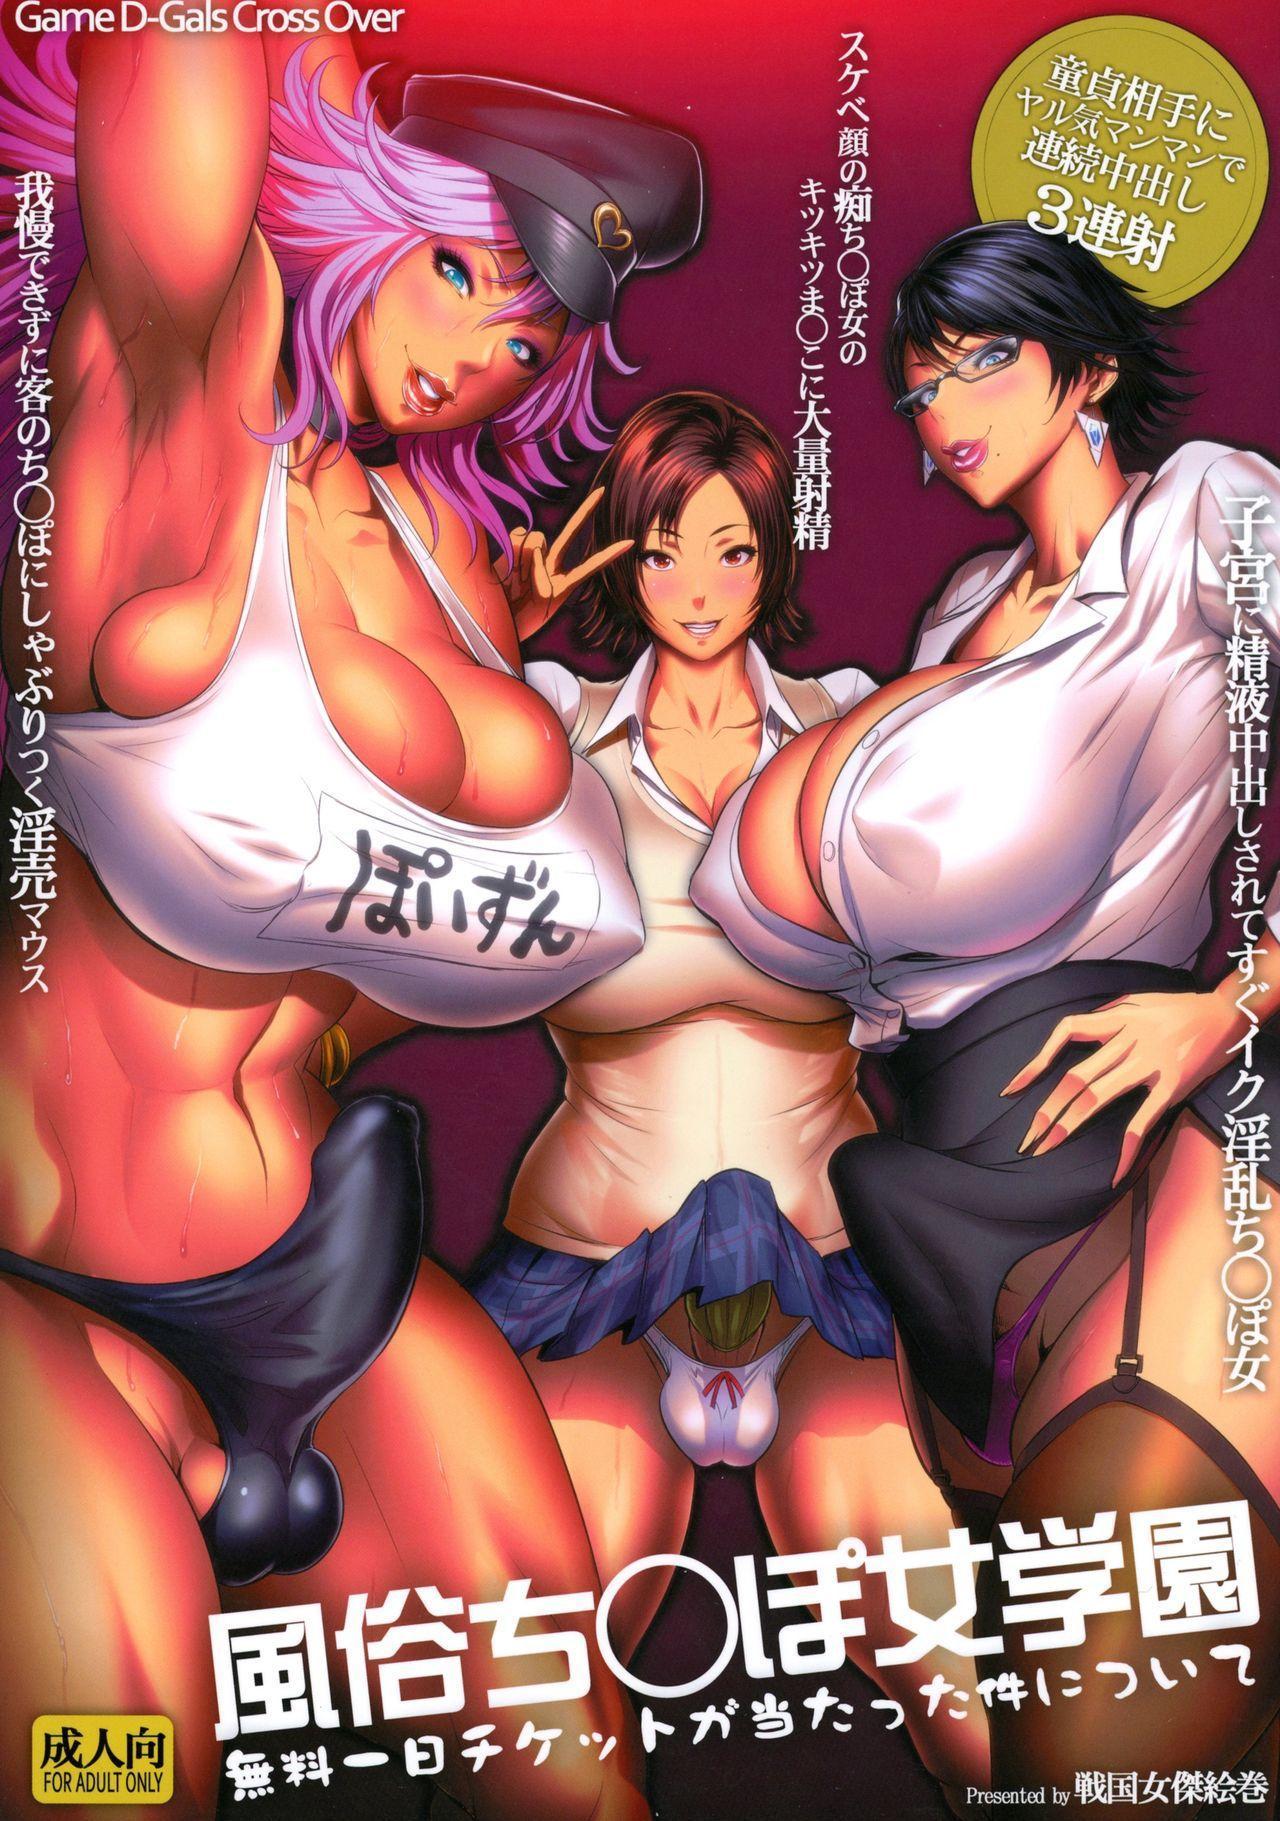 Fuuzoku Chinpo Jogakuen | Sexy Penis Women Academy 1